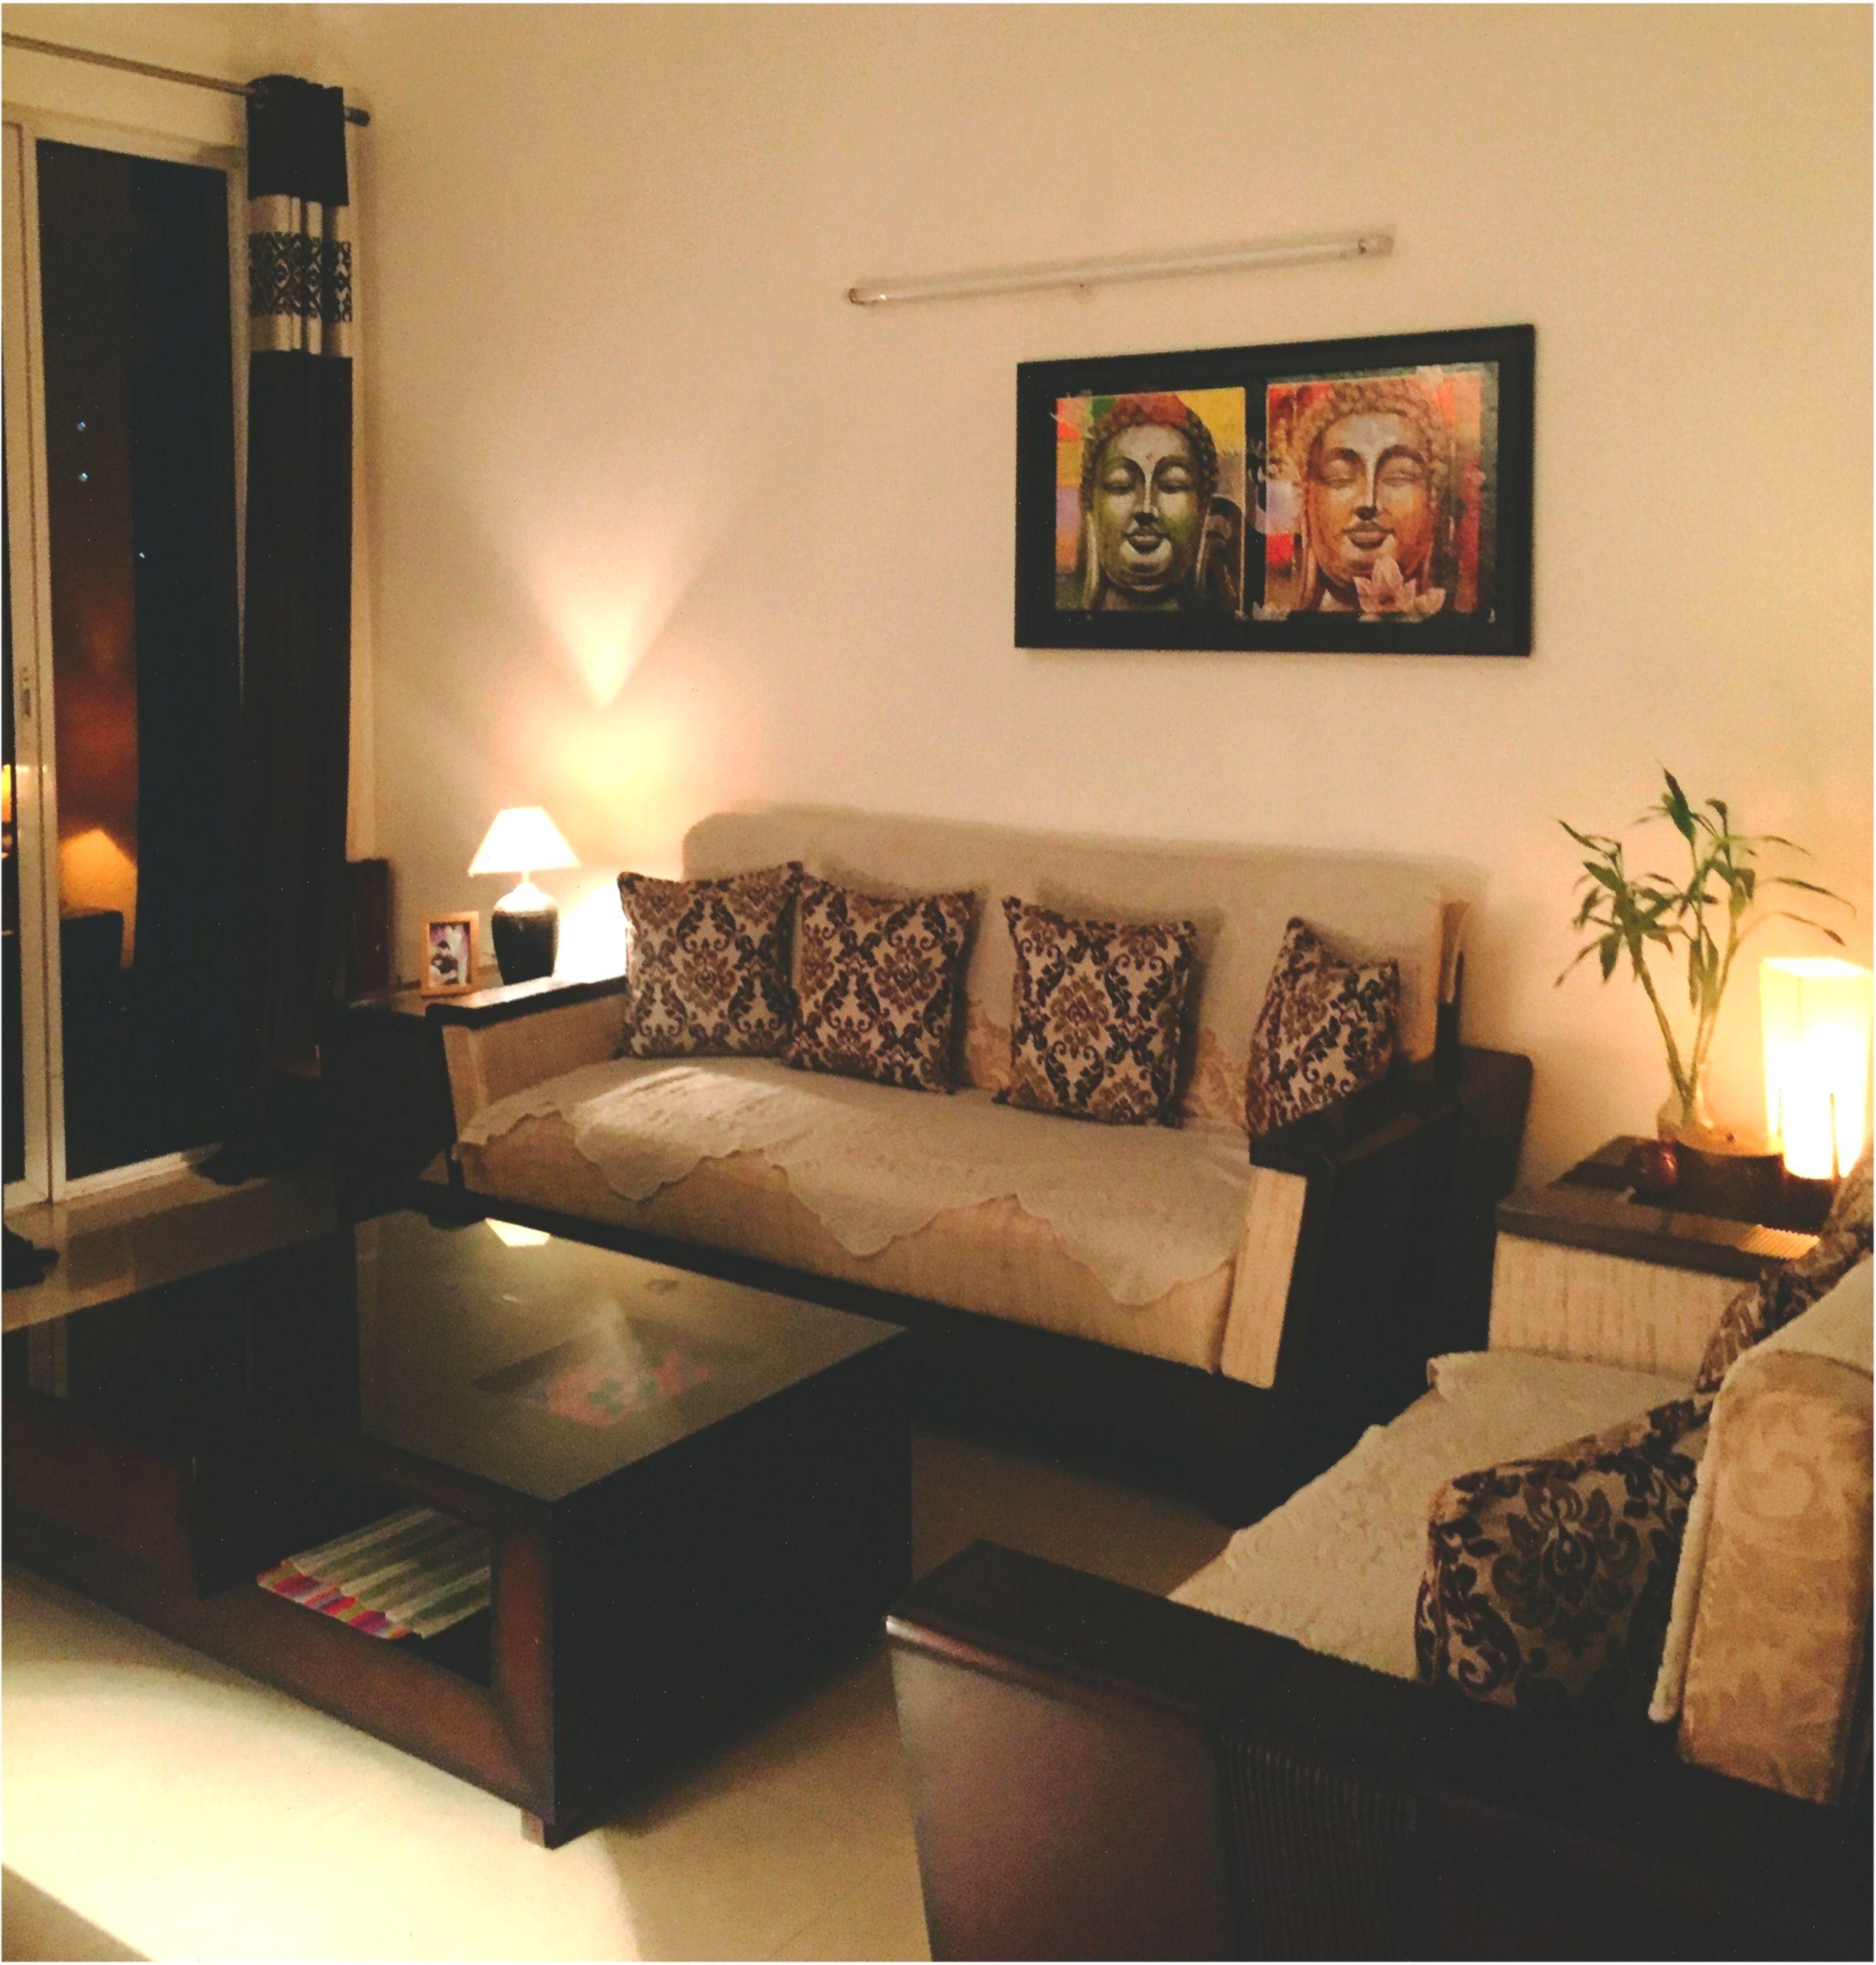 14 Amazing Living Room Designs Indian Style Interior And Decorating Ideas Homedecorlivingroom Amazing Living Design Indian Living Rooms Living Room Designs